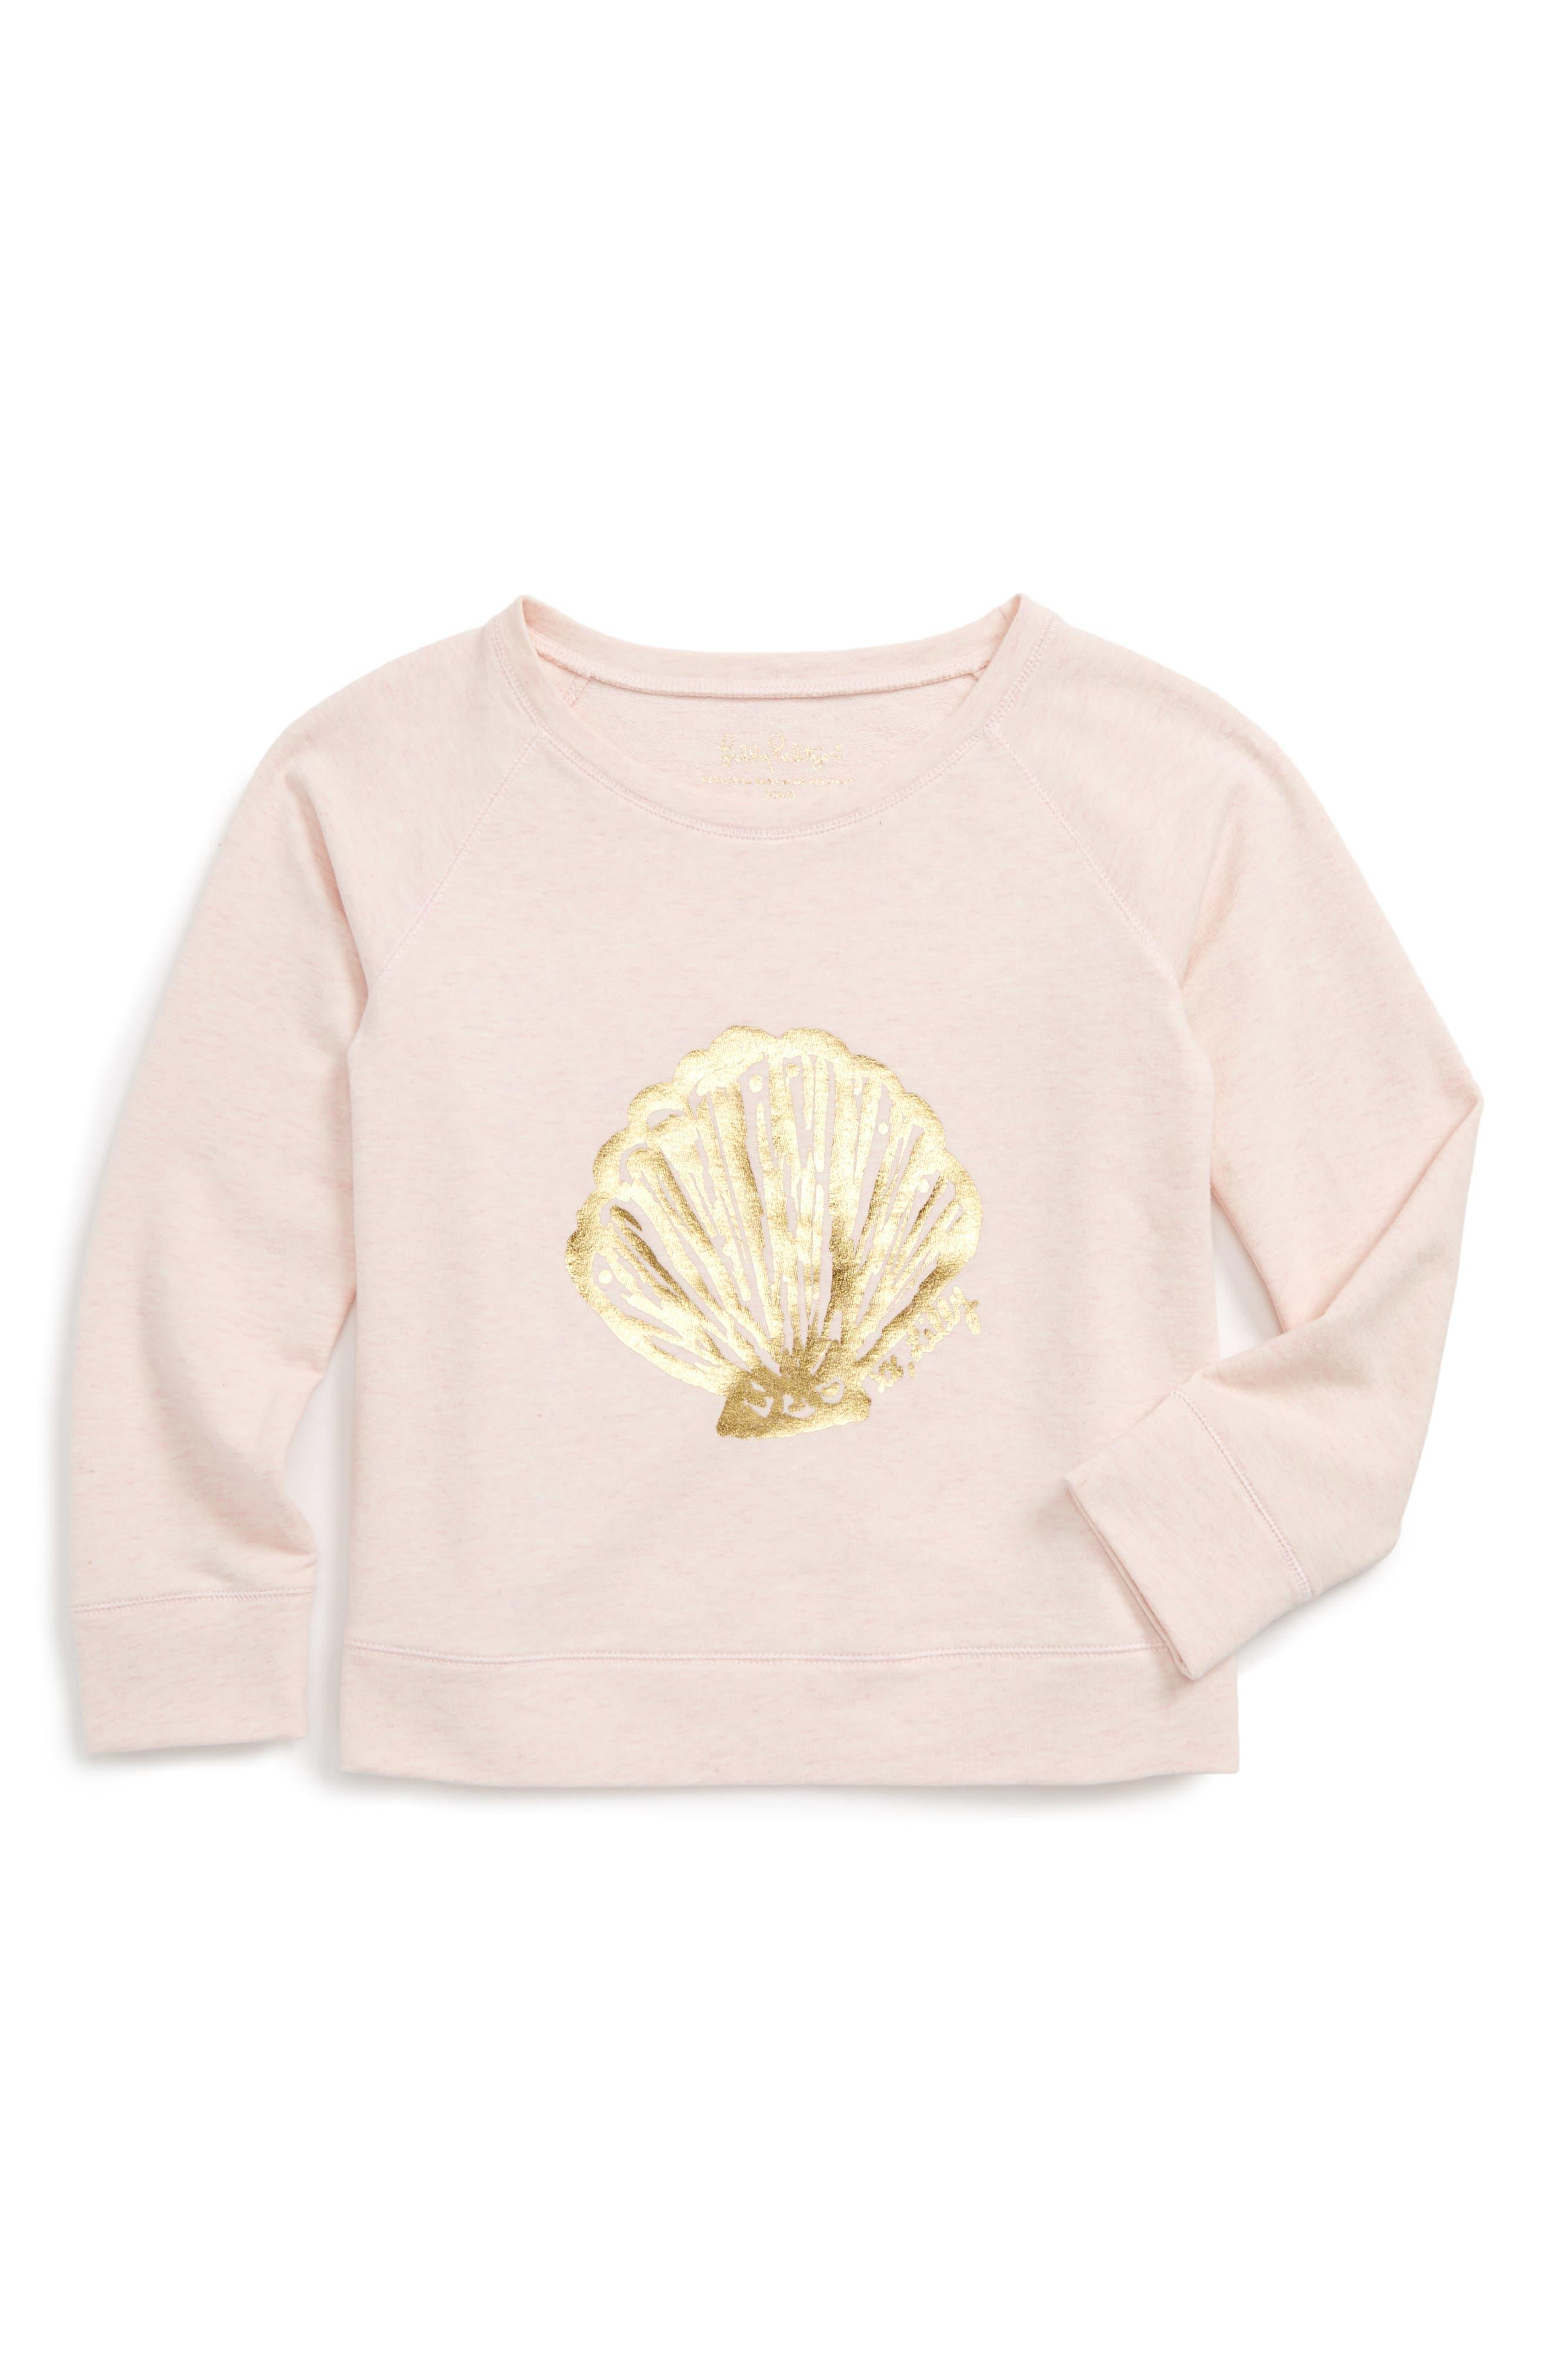 Lilly Pulitzer Shara Graphic Print Sweatshirt (Toddler Girls, Little Girls & Big Girls)